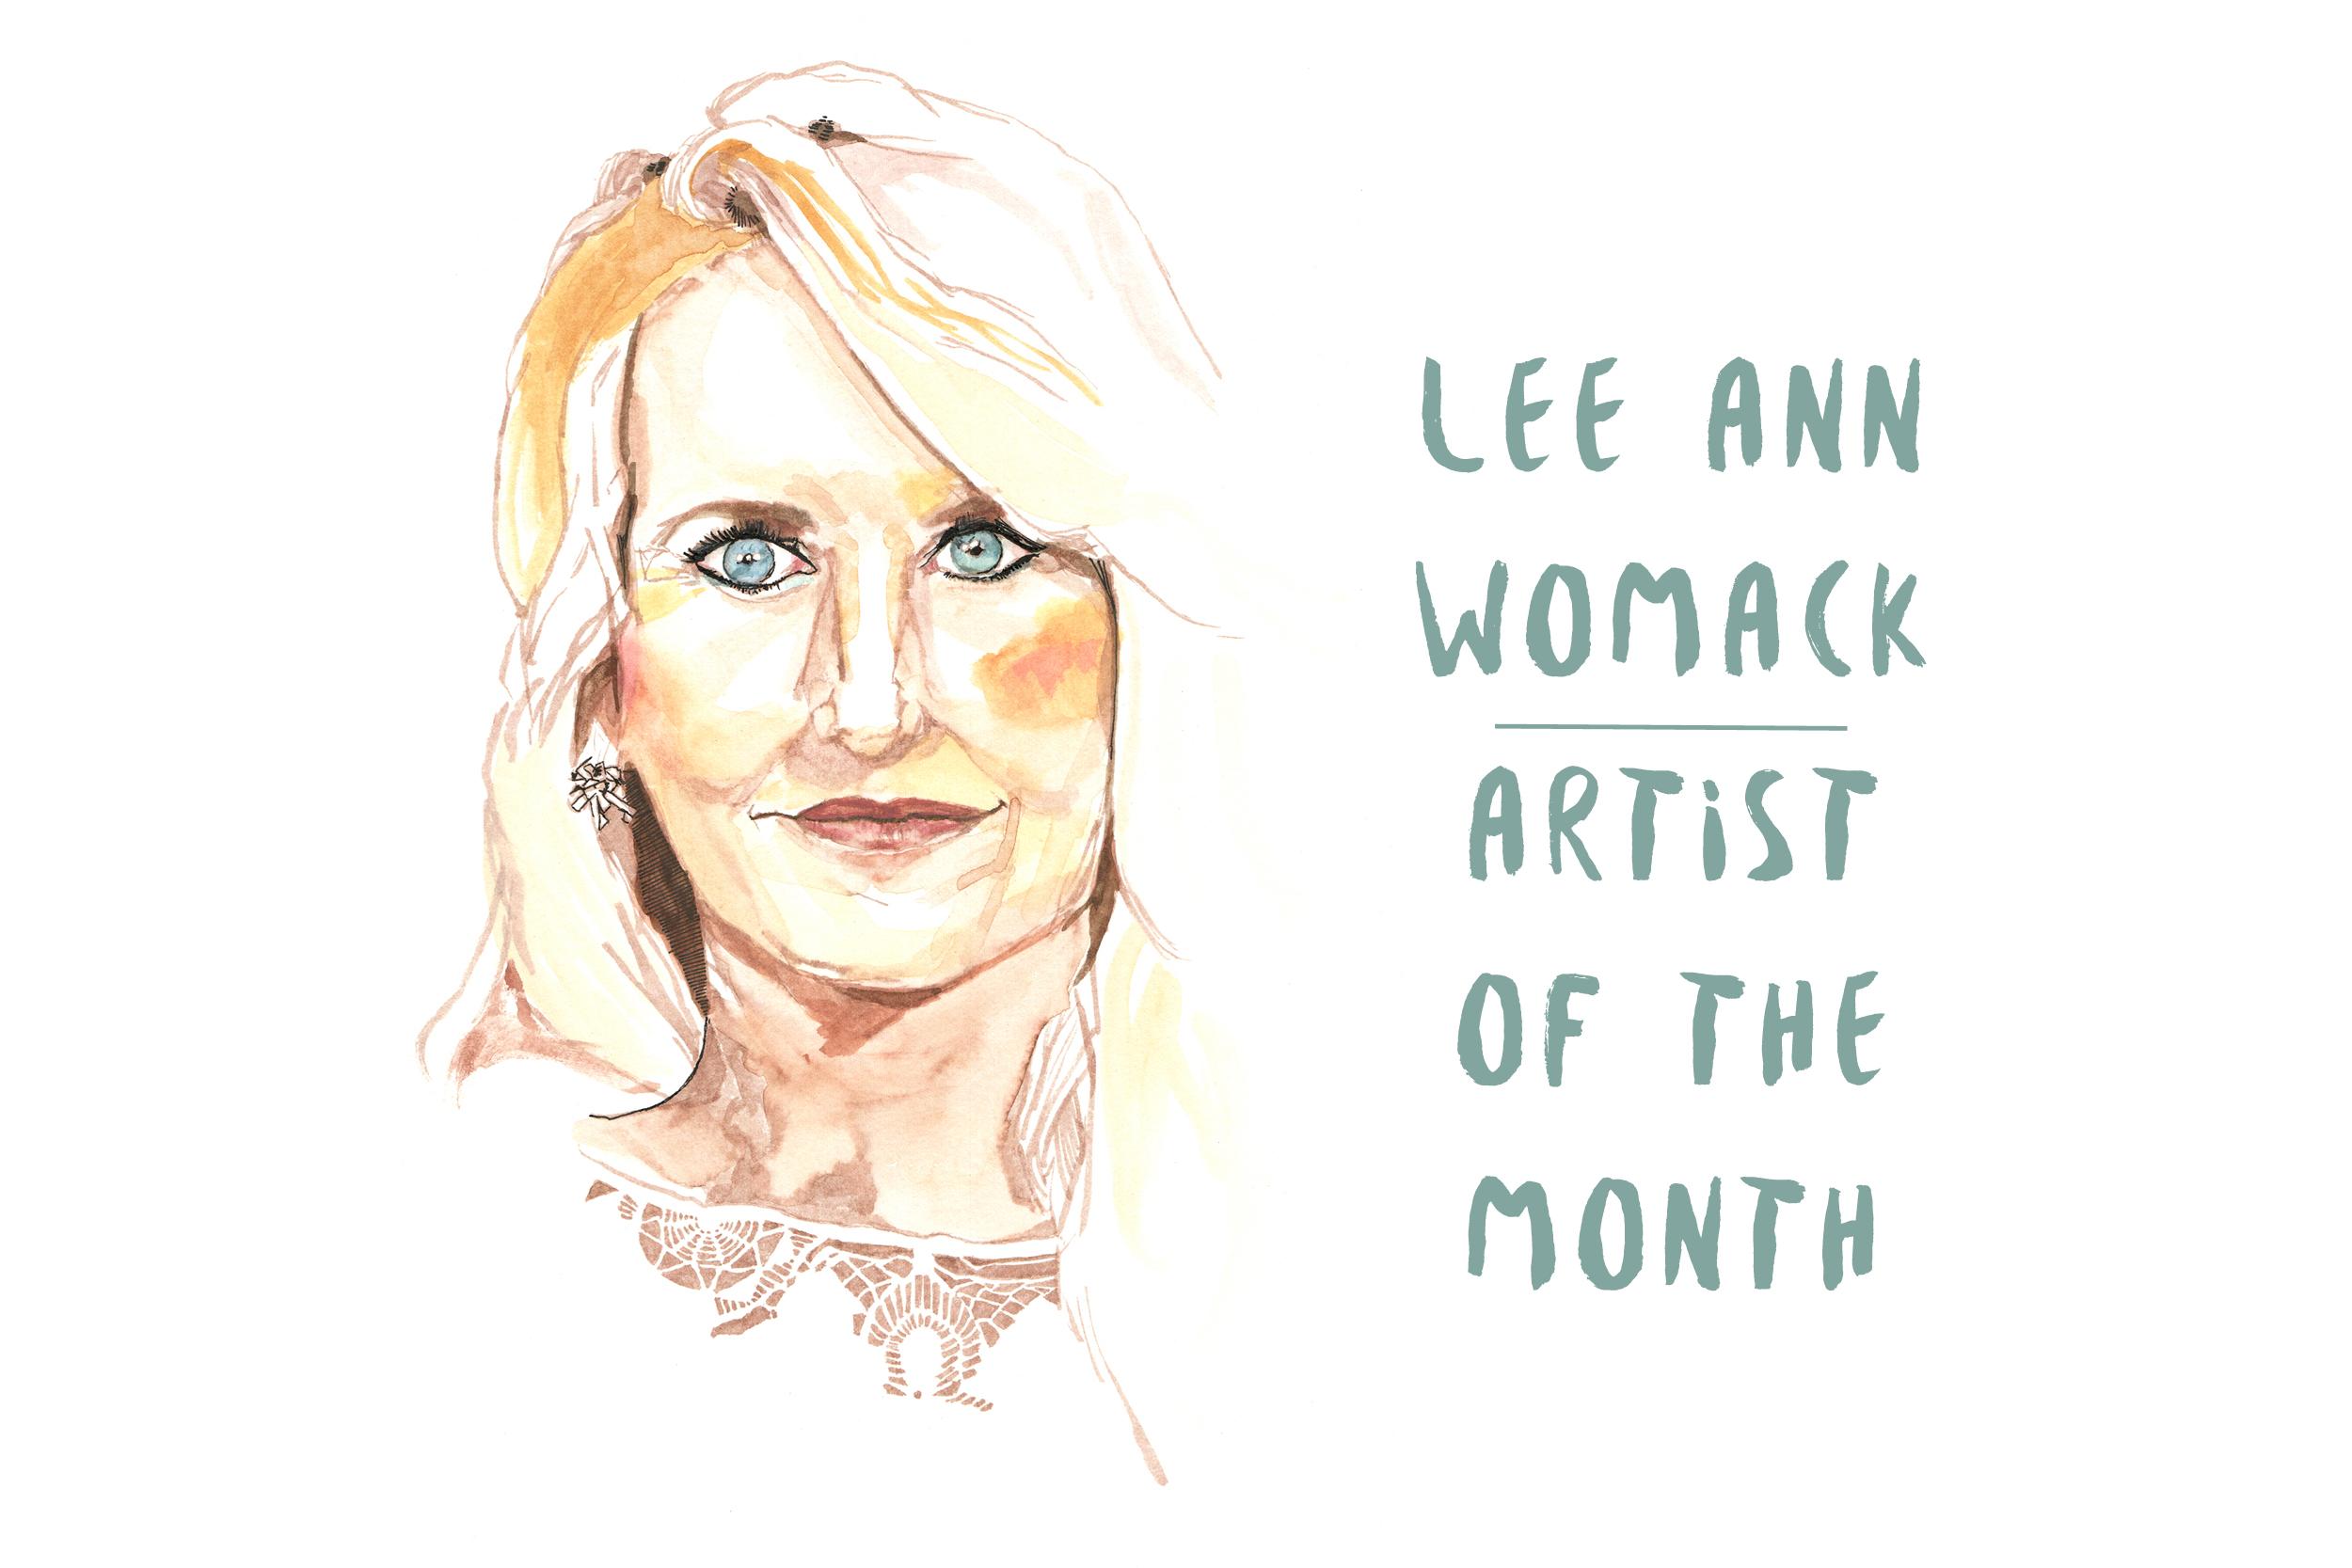 Lee Ann Womack: Keeping it Real